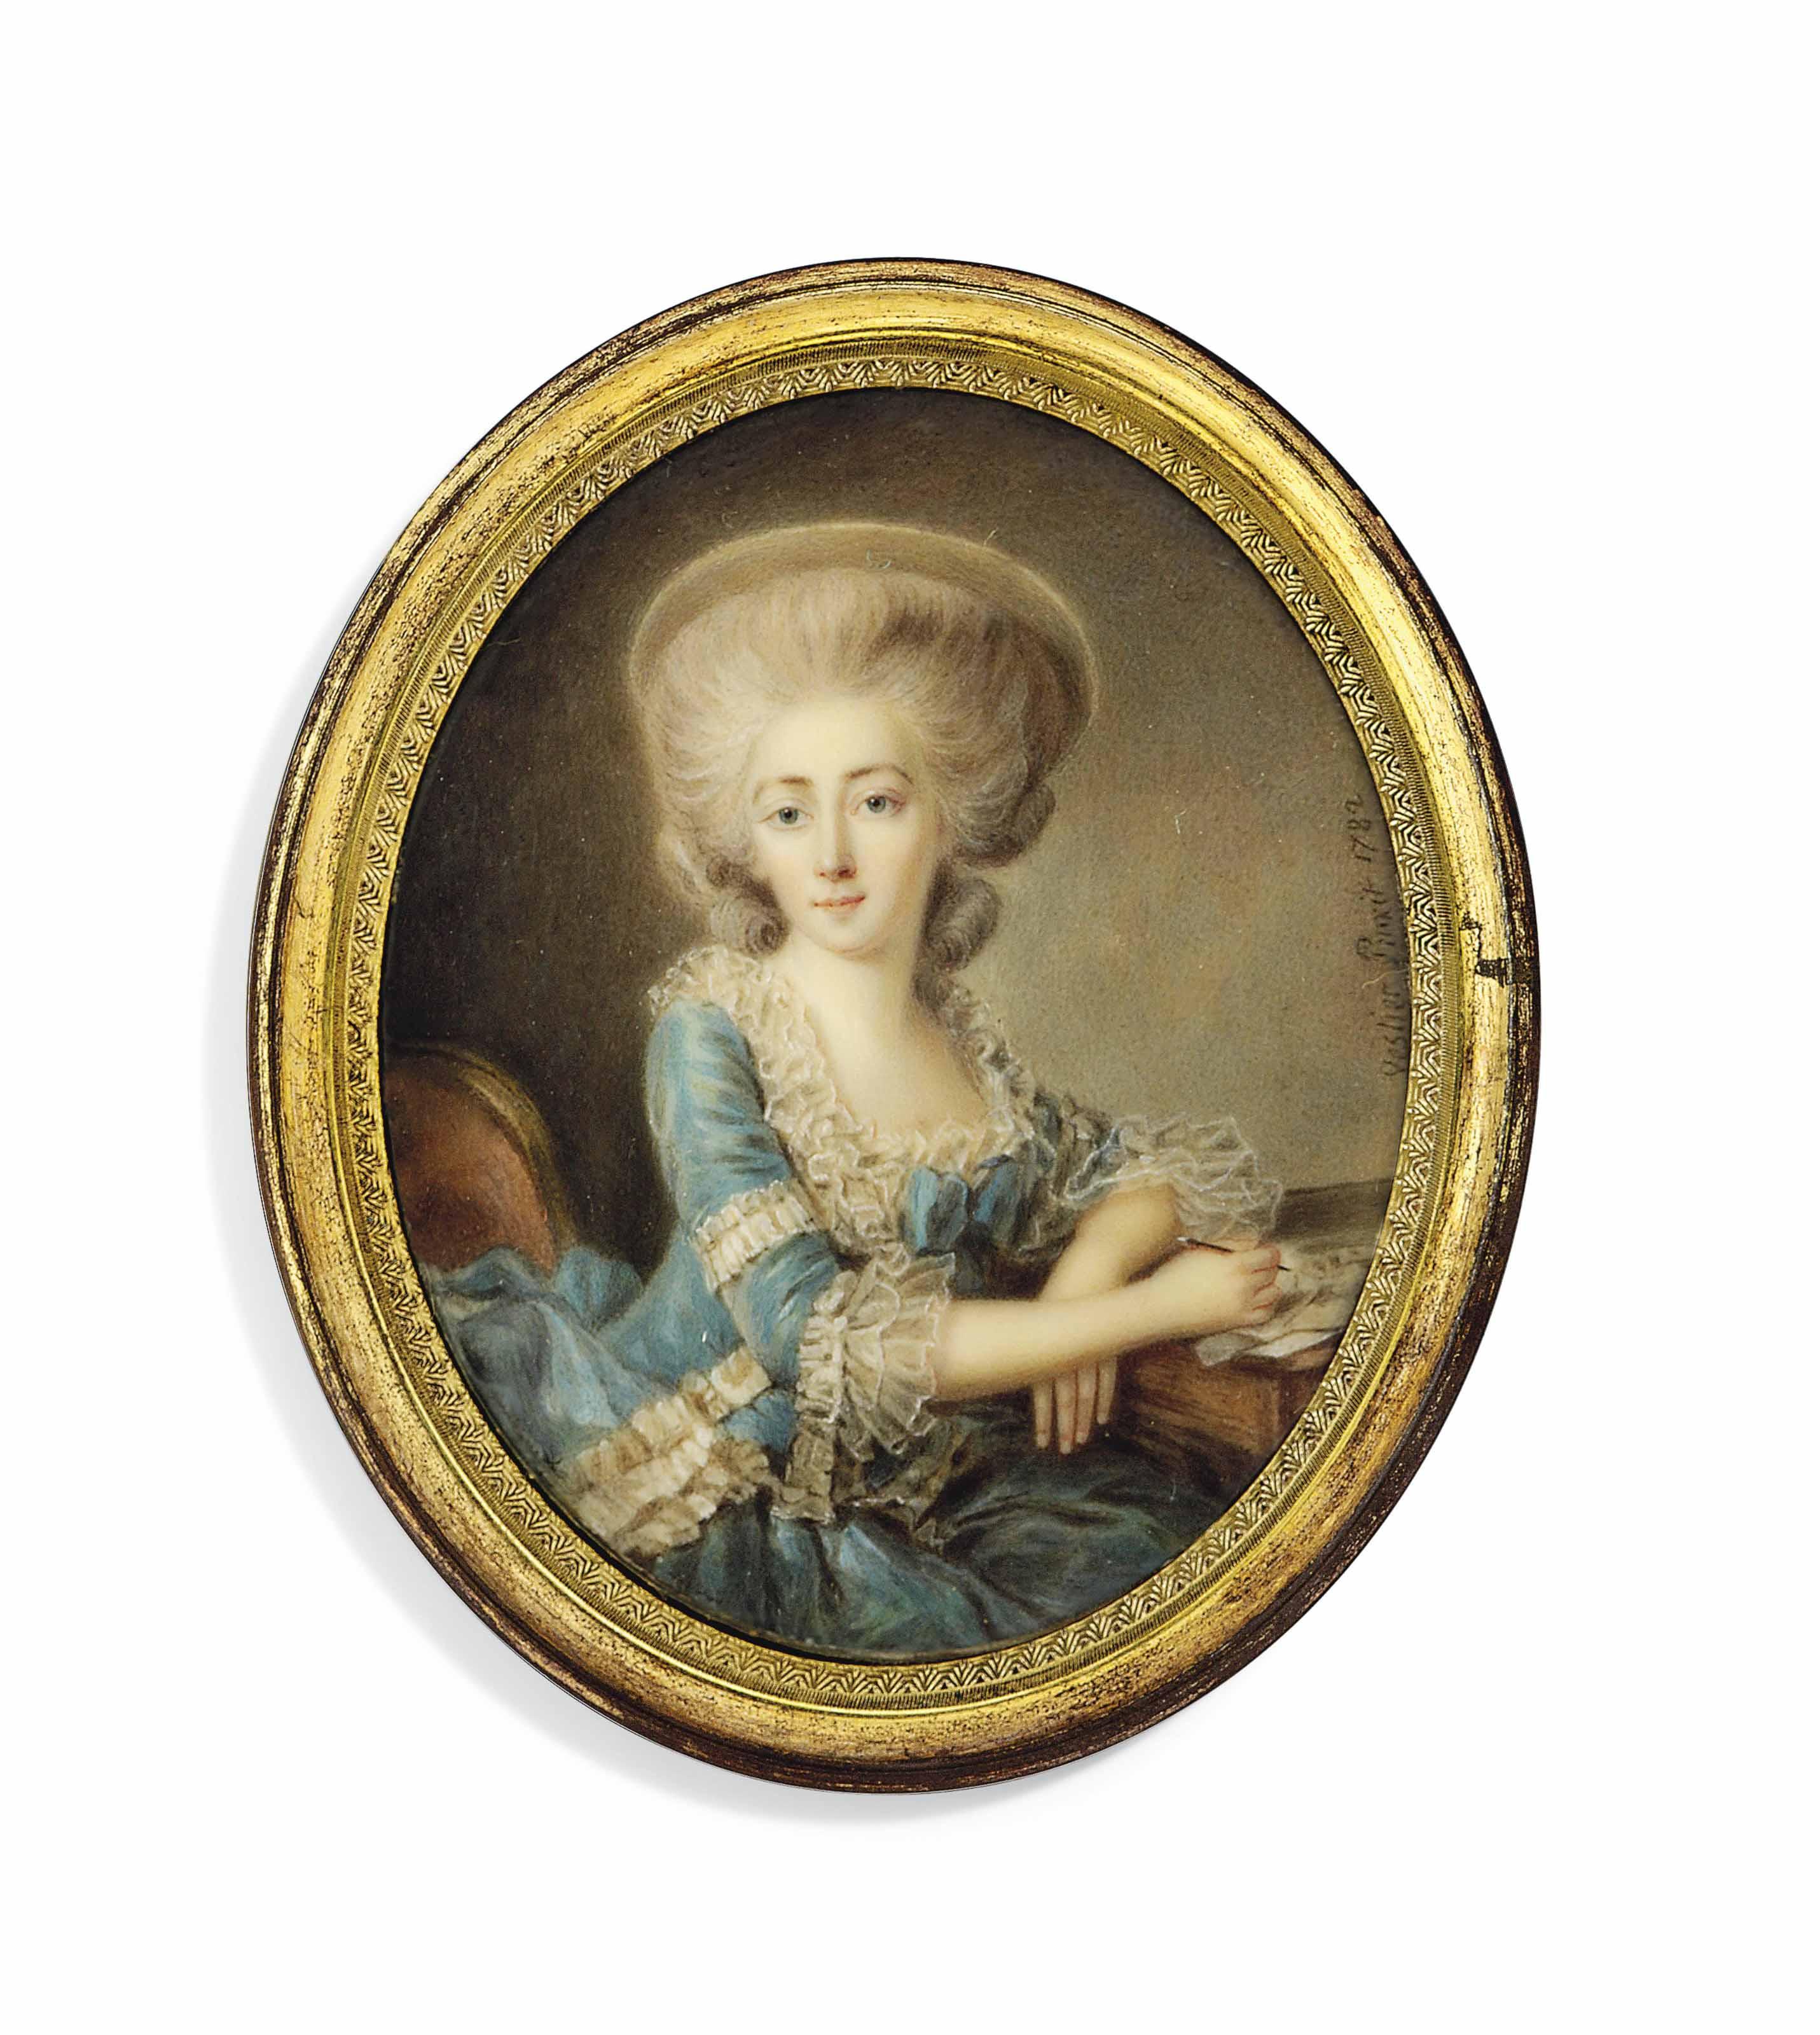 ANTOINE VESTIER (FRENCH, 1740-1824)